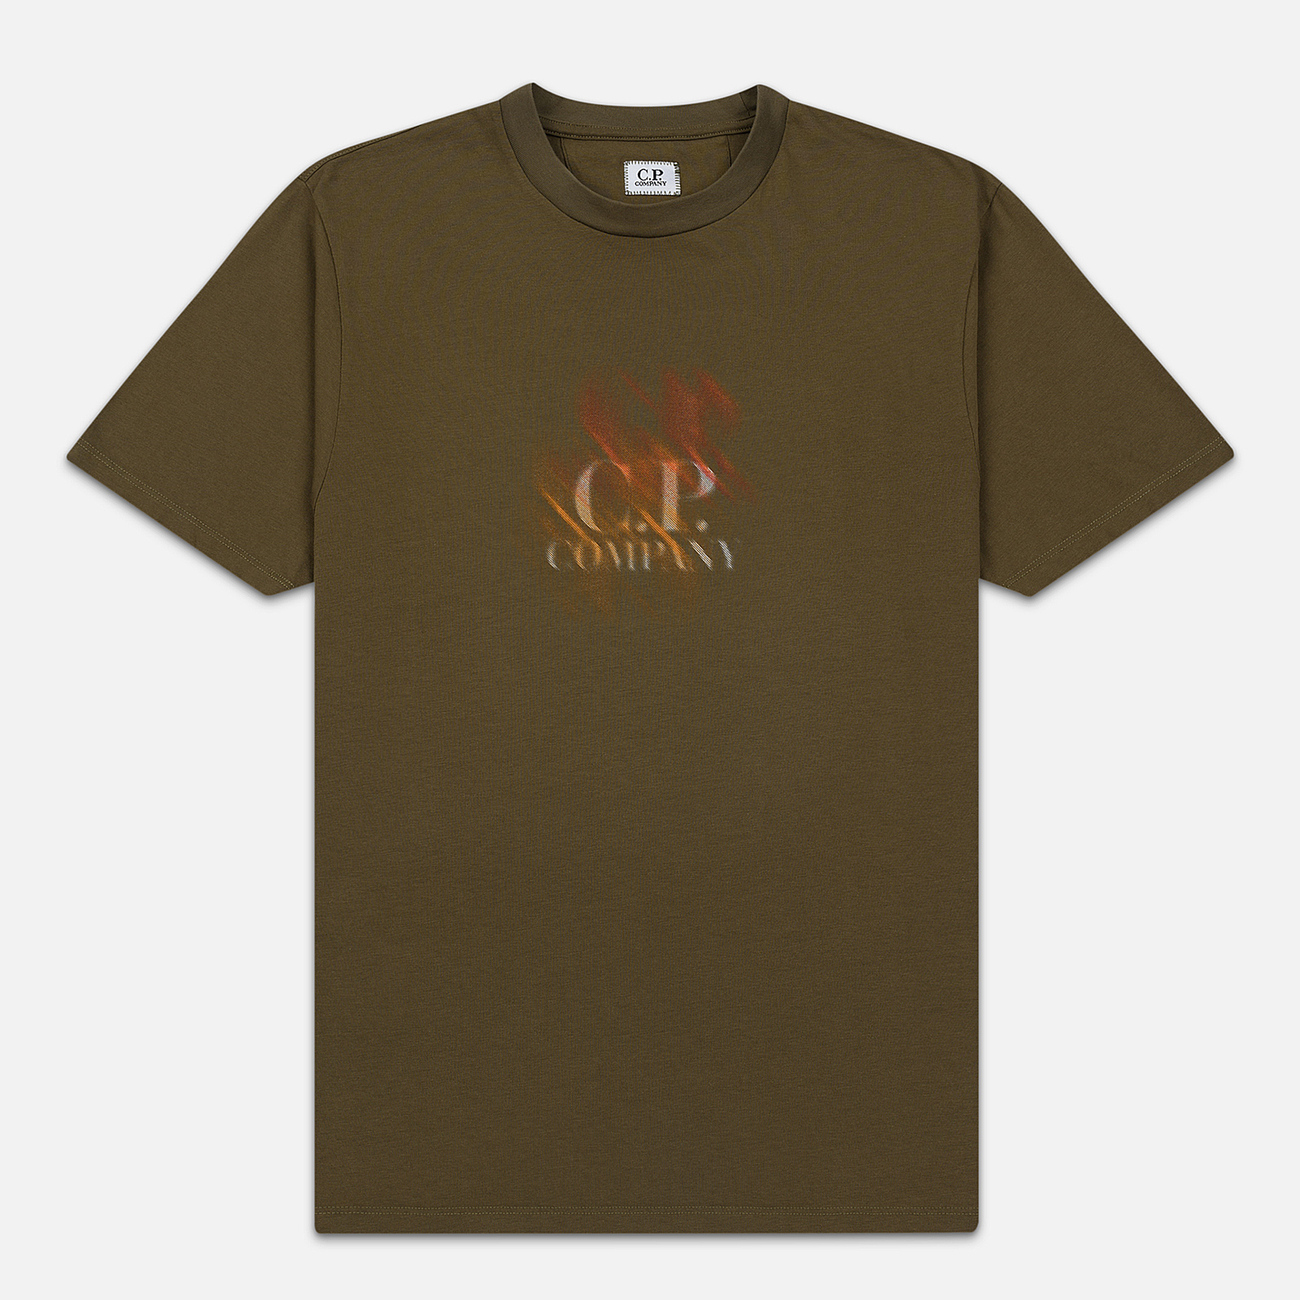 Мужская футболка C.P. Company Blurred Graphic Logo Olive Night